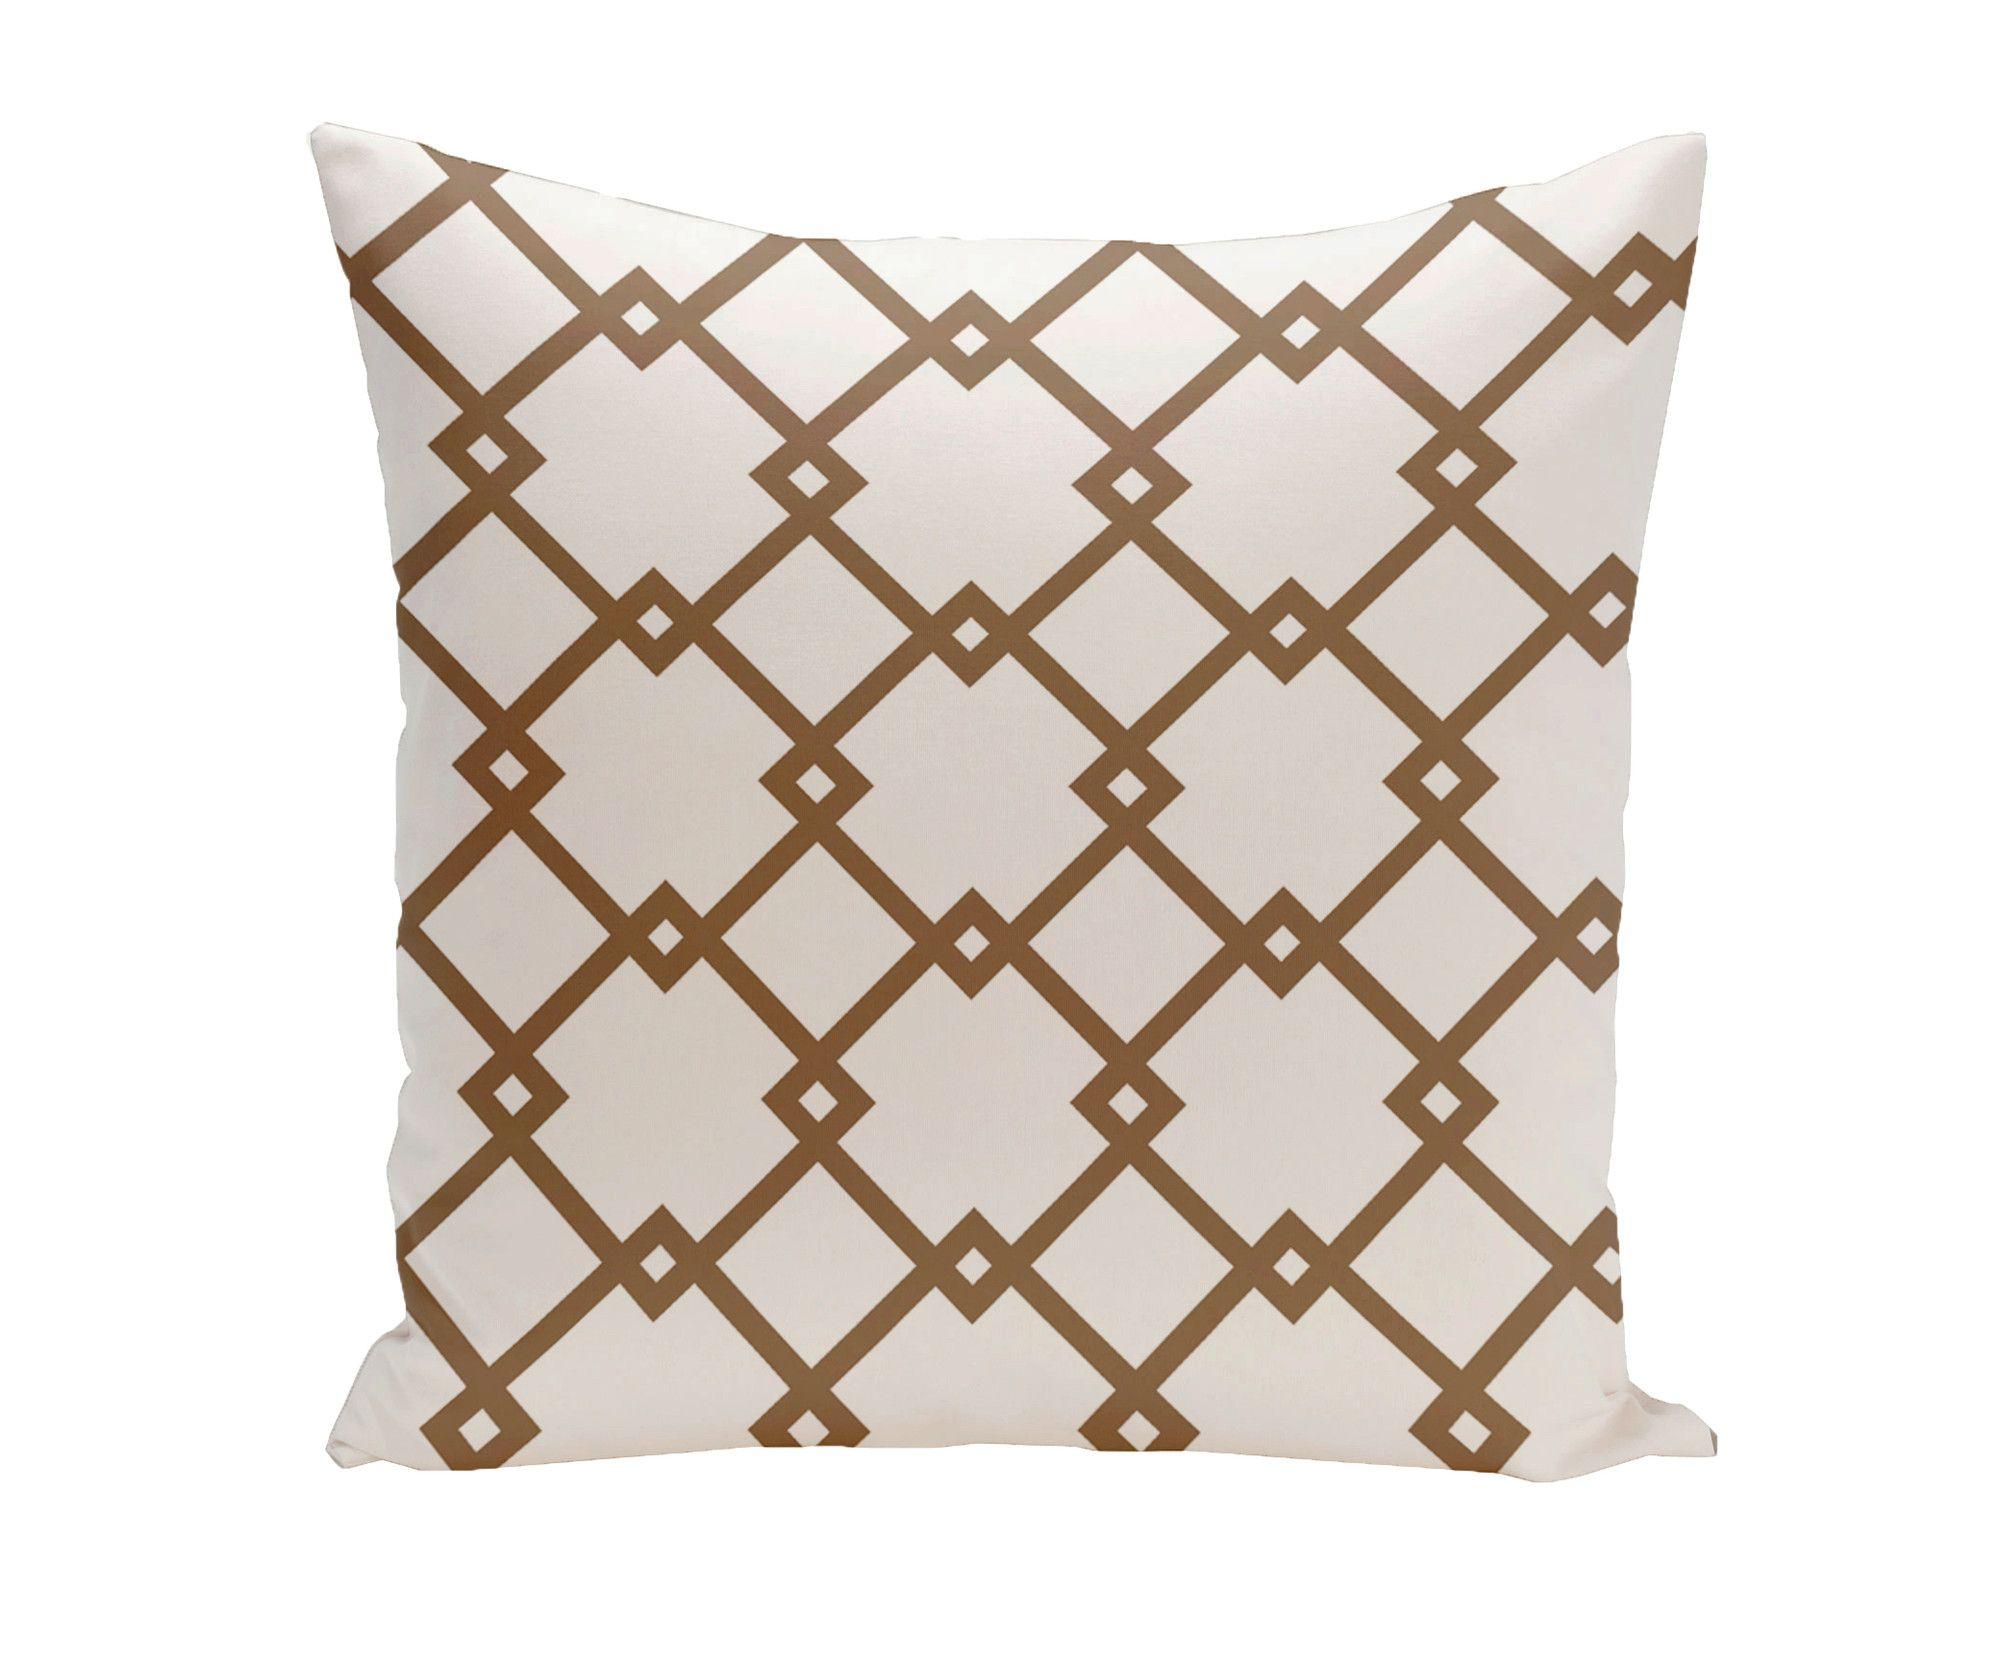 Byfield Geometric Euro Pillow